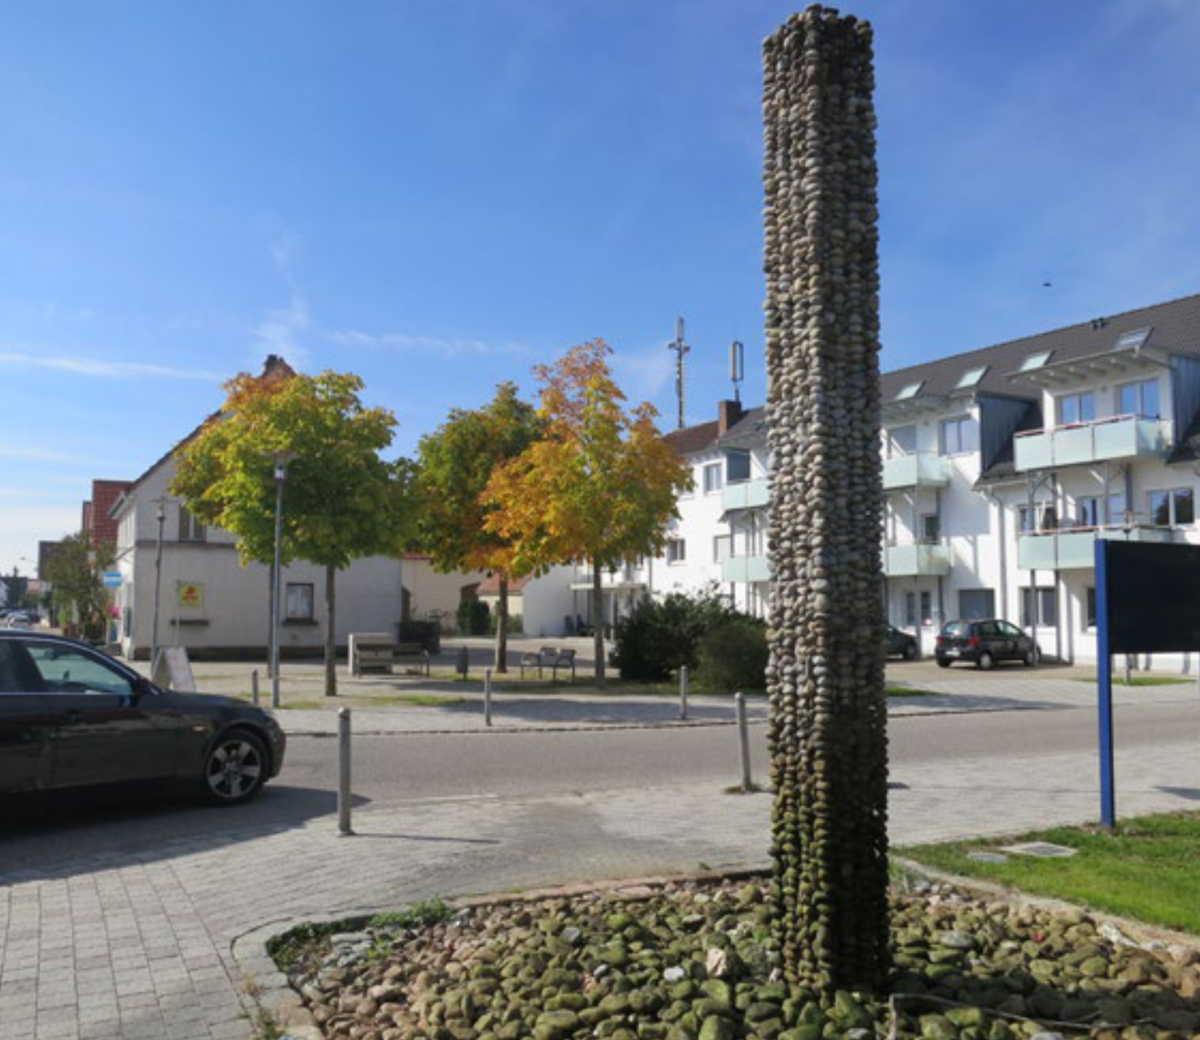 Burlafingen Neu Ulm